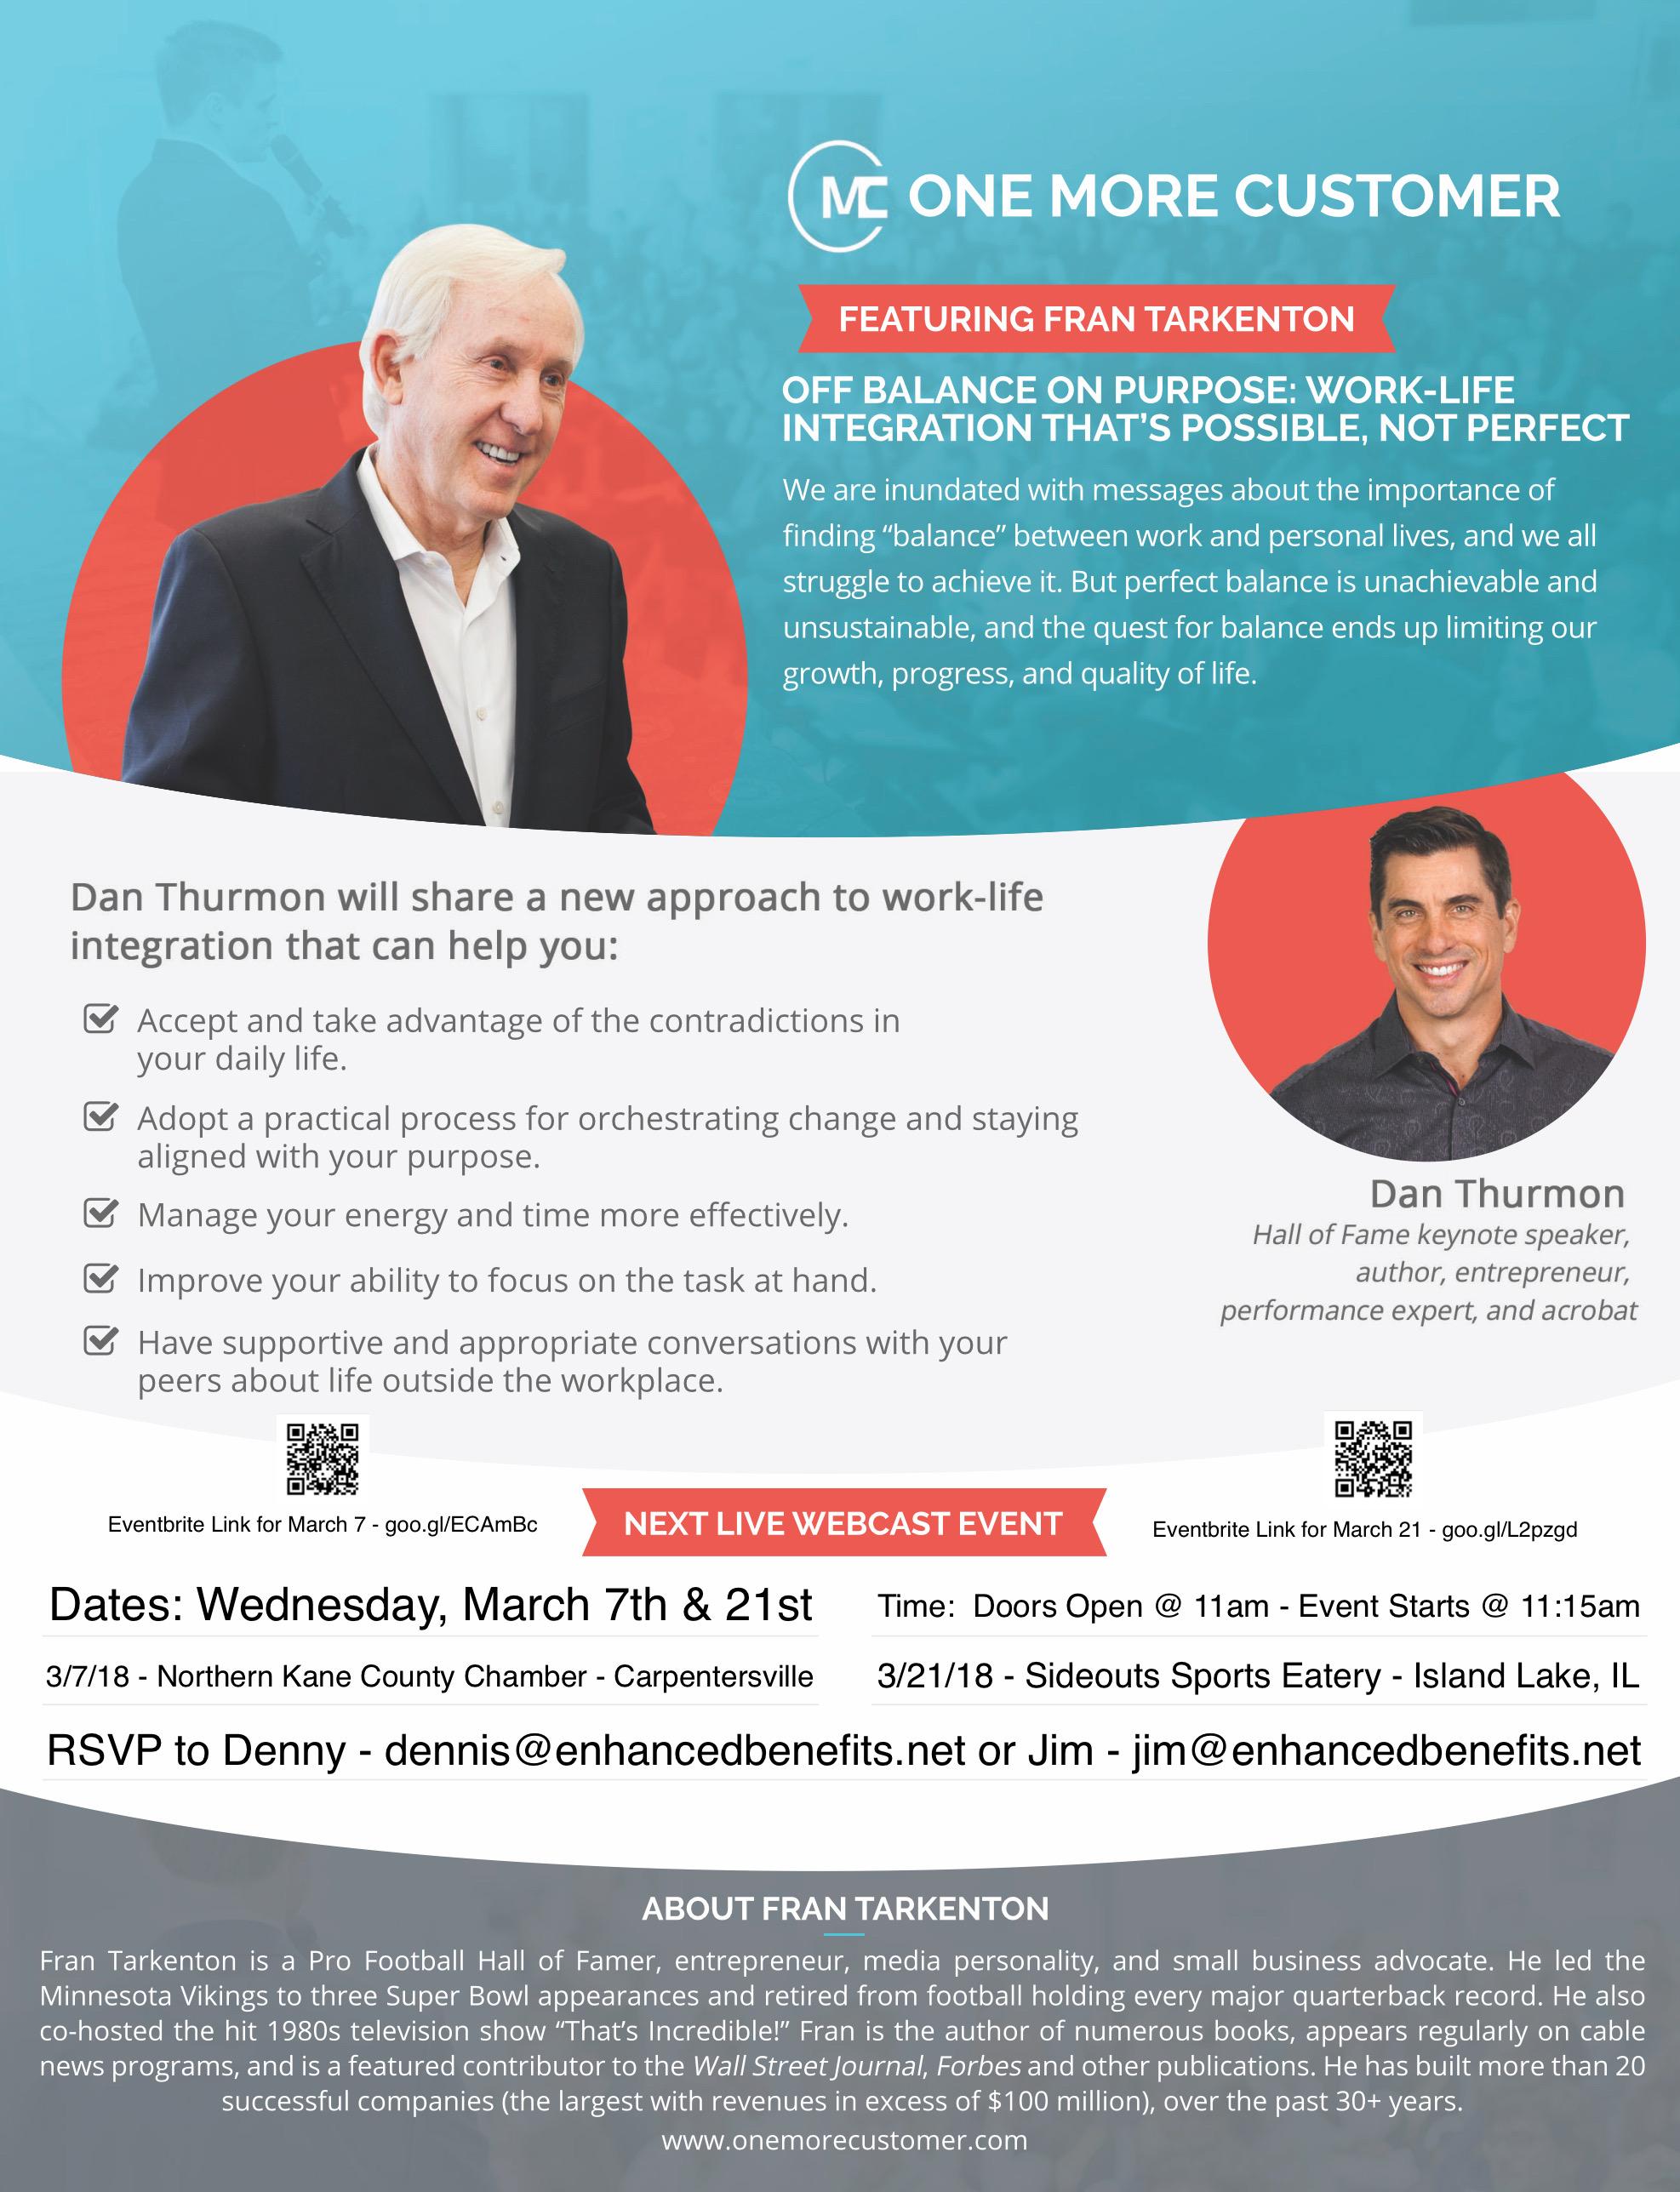 OMC Invite - Dan Thurman